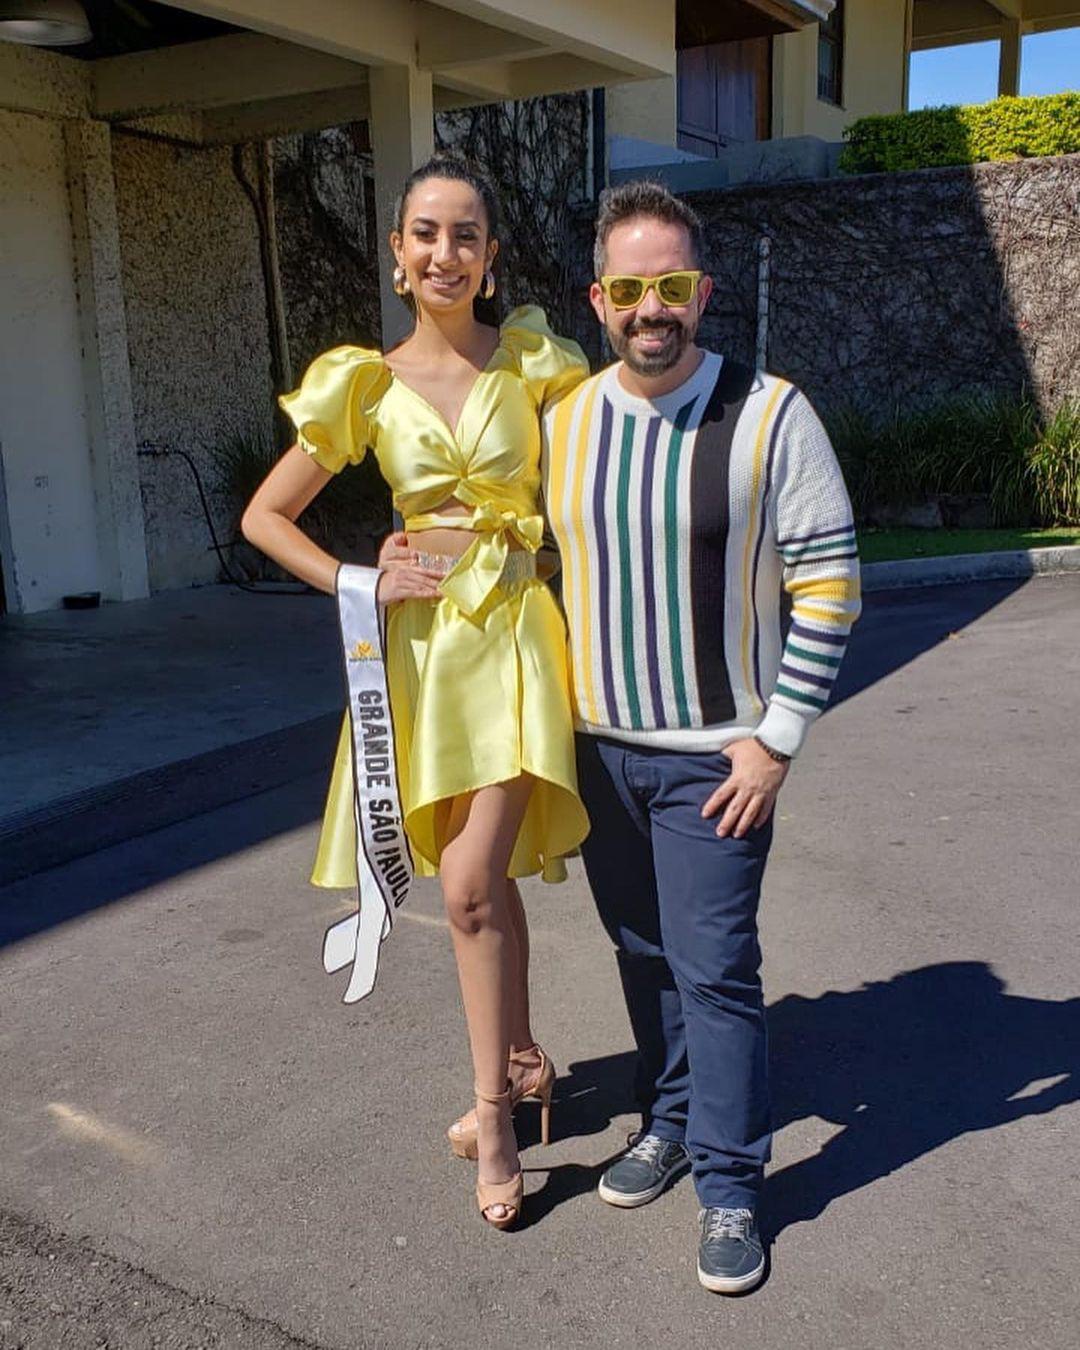 sandy menezes, miss grande sao paulo mundo 2019. - Página 4 Fmtq1e10